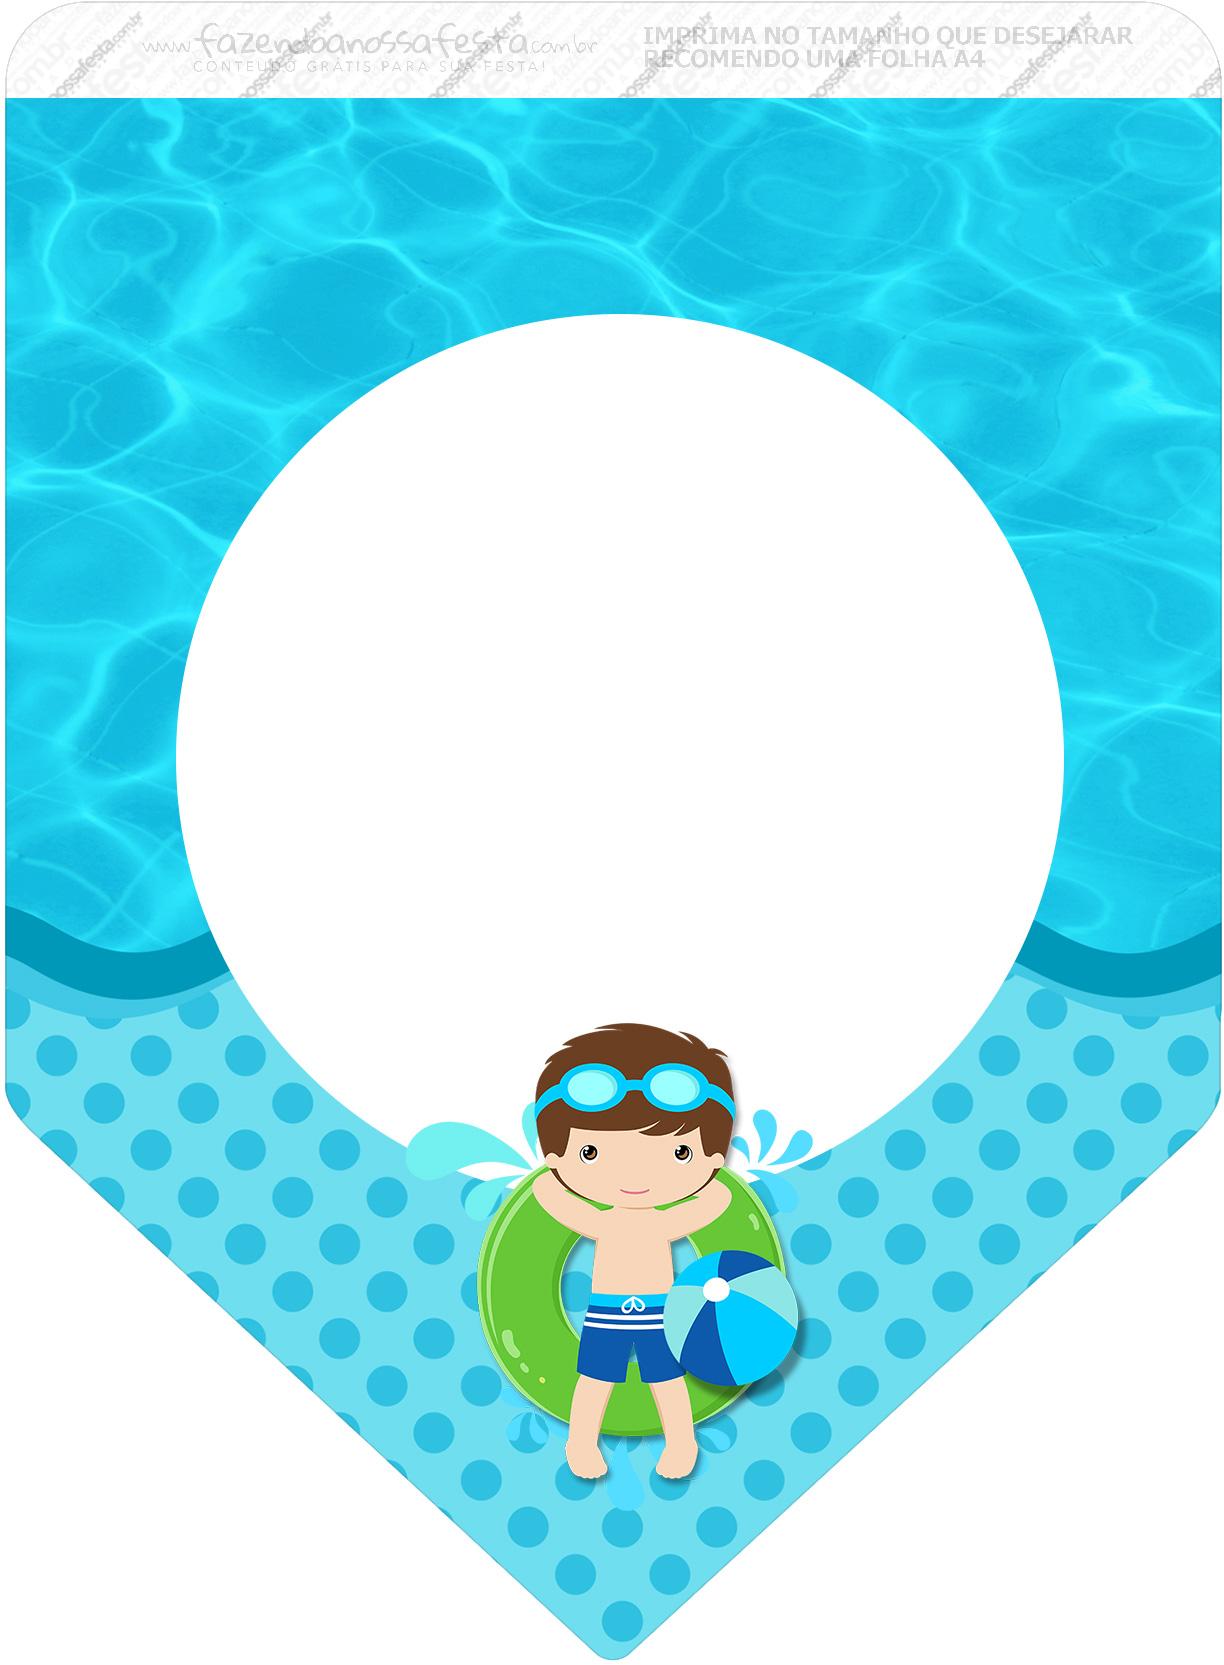 Bandeirinha Varalzinho 3 Pool Party Menino